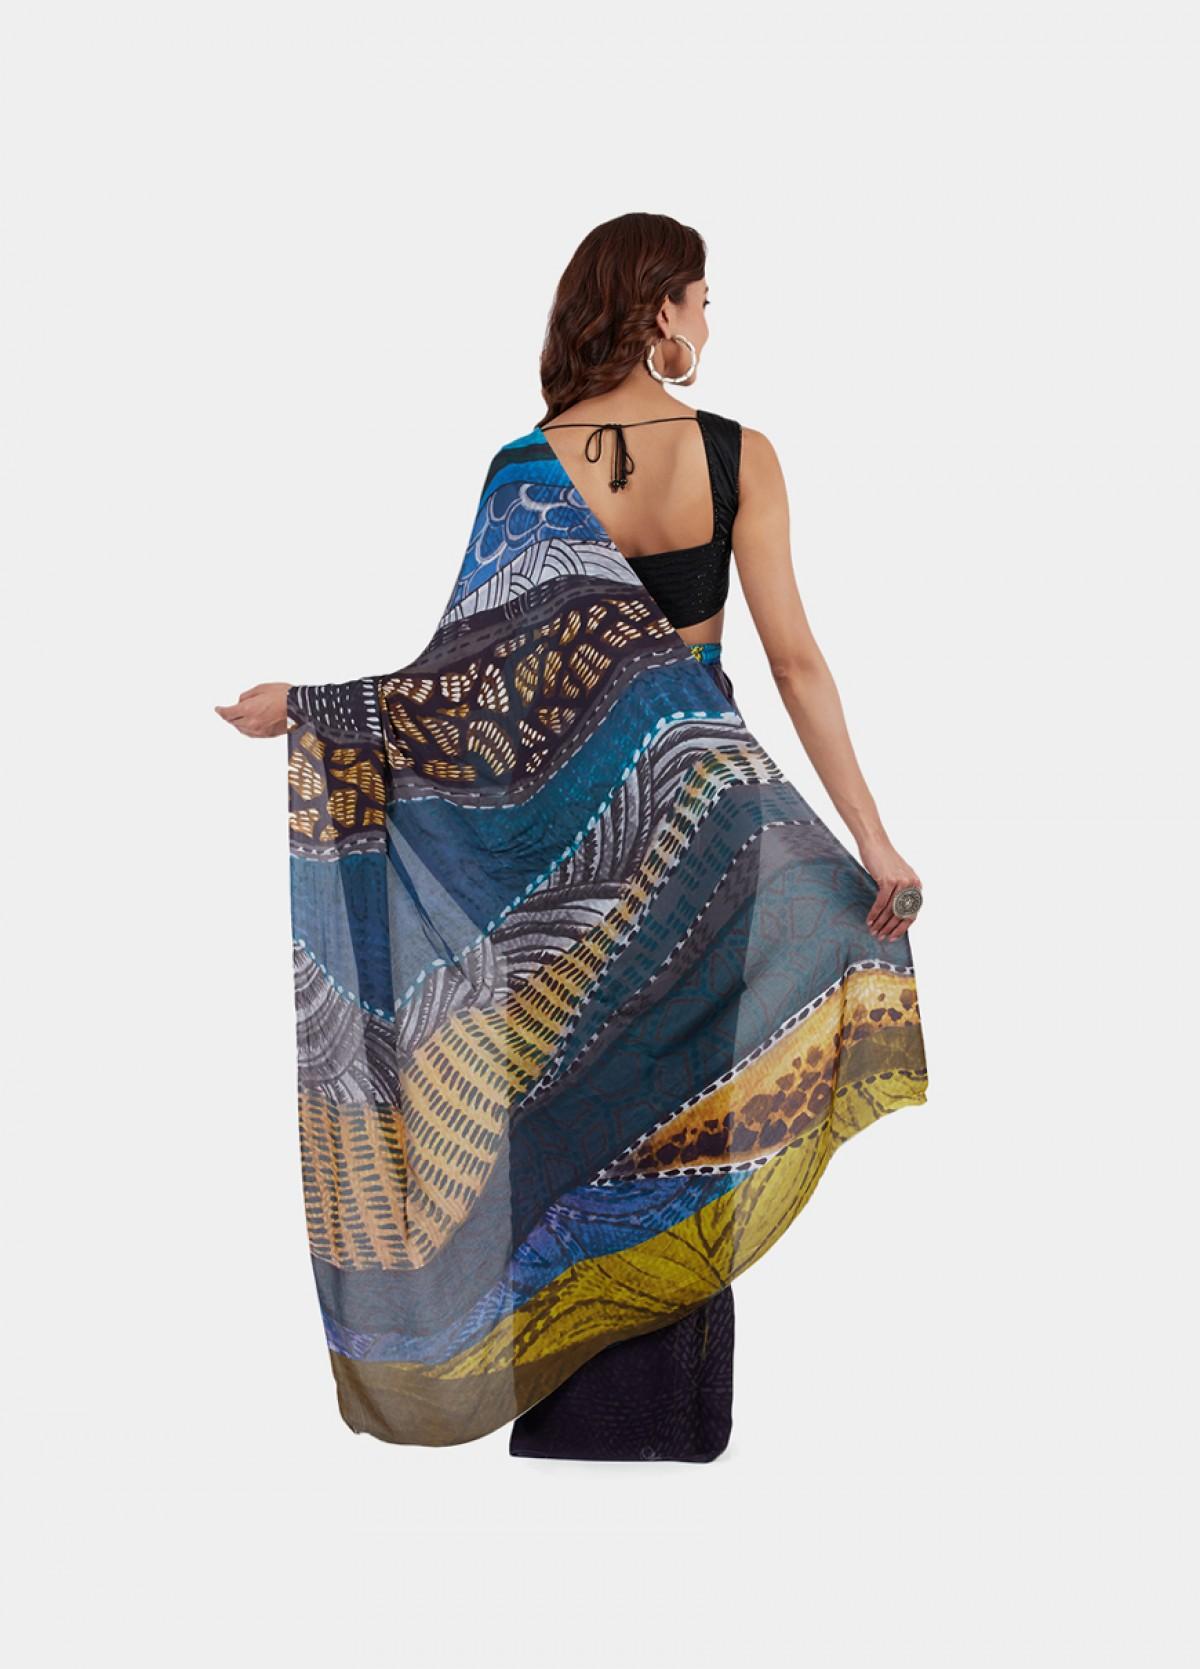 The Gond Sari